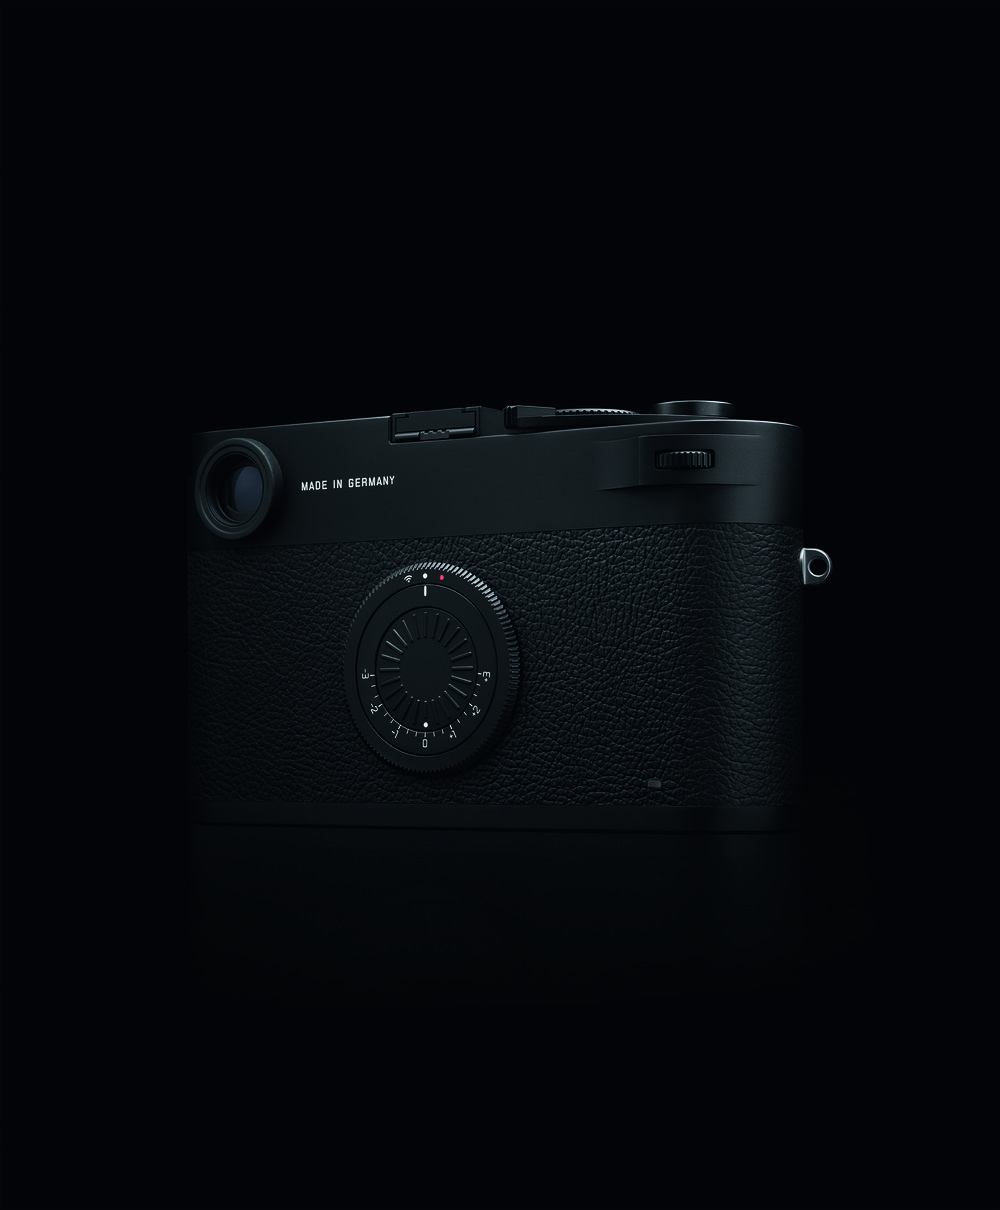 Leica_M10-D_Totale_back_schwarz_LoRes_CMYK.jpg